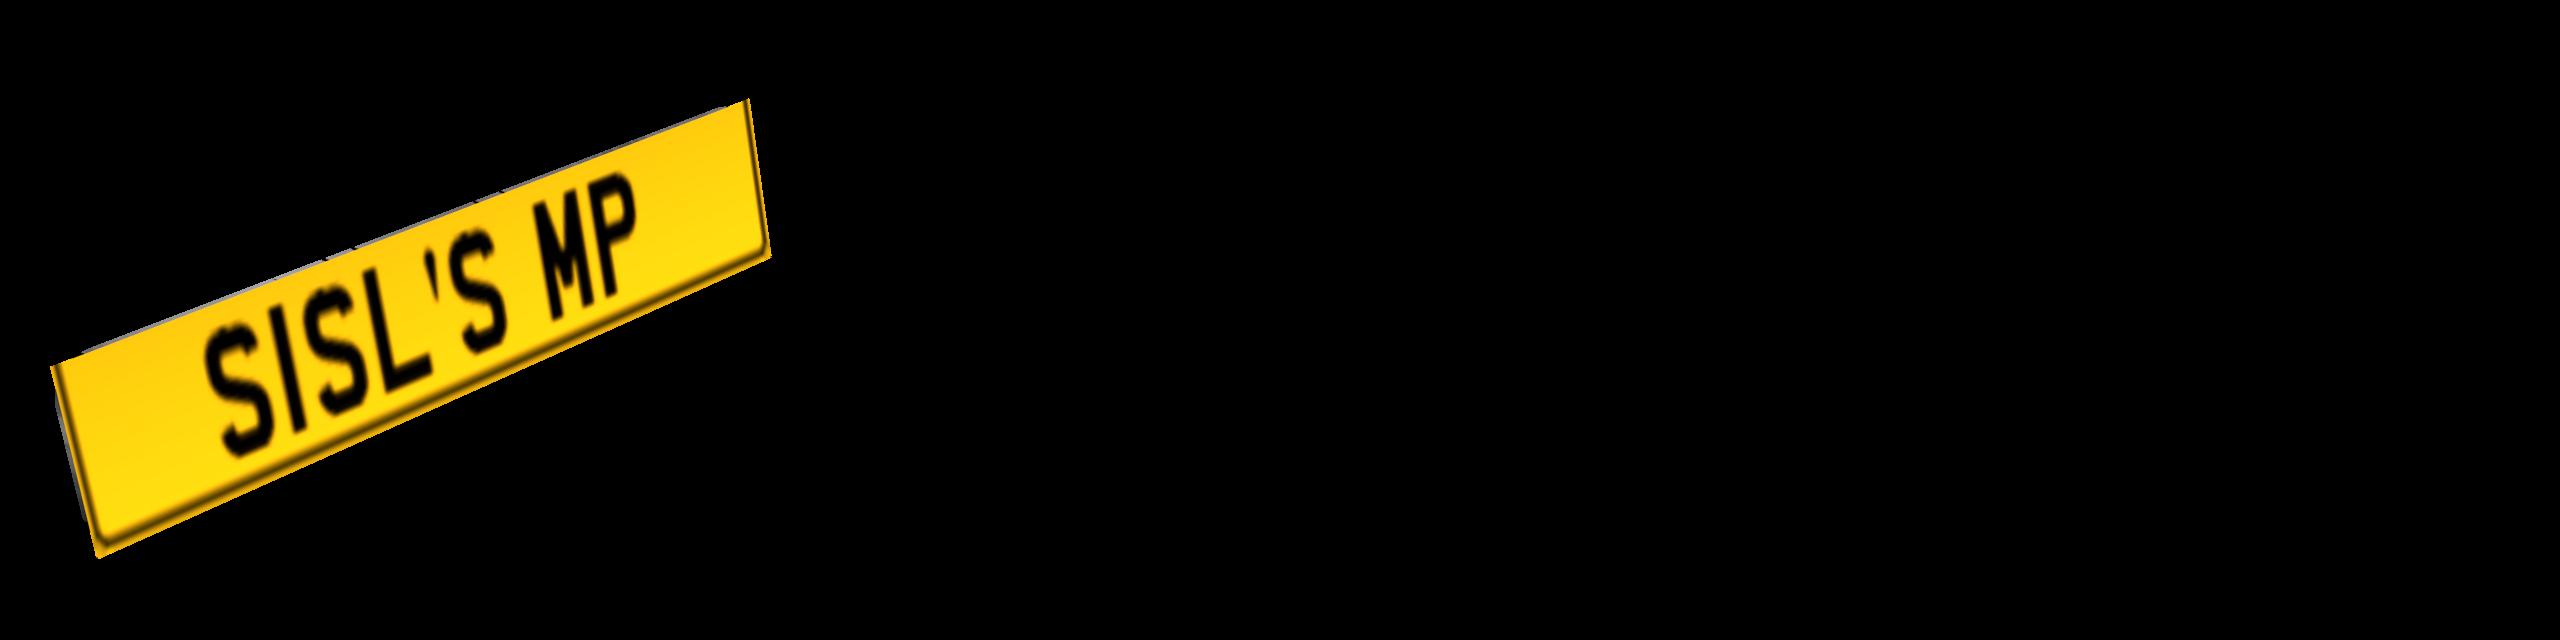 Standart Plate (Yellow) (Standart Plate (Sarı)) for Euro Truck Simulator 2.